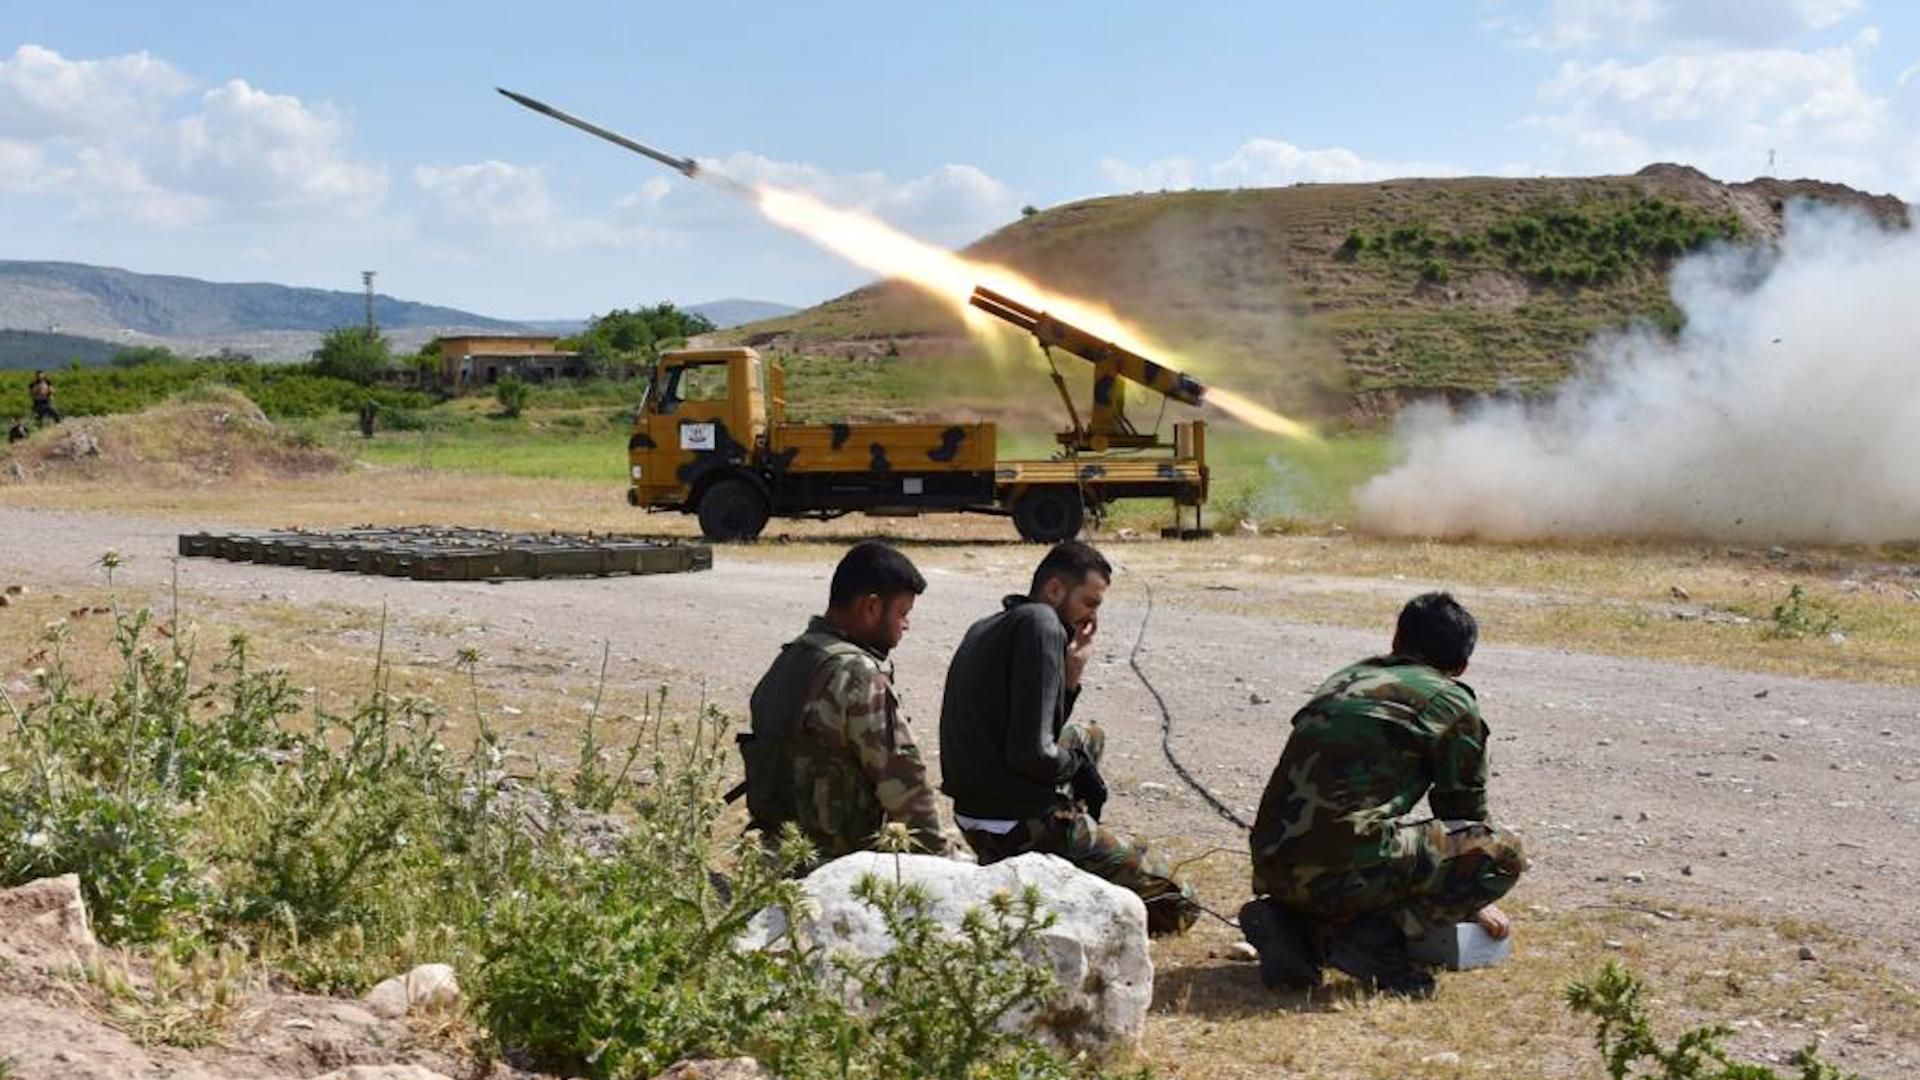 Photo of قوات النظام تعلن استئنافها للعمليات العسكرية في عموم منزوعة السلاح